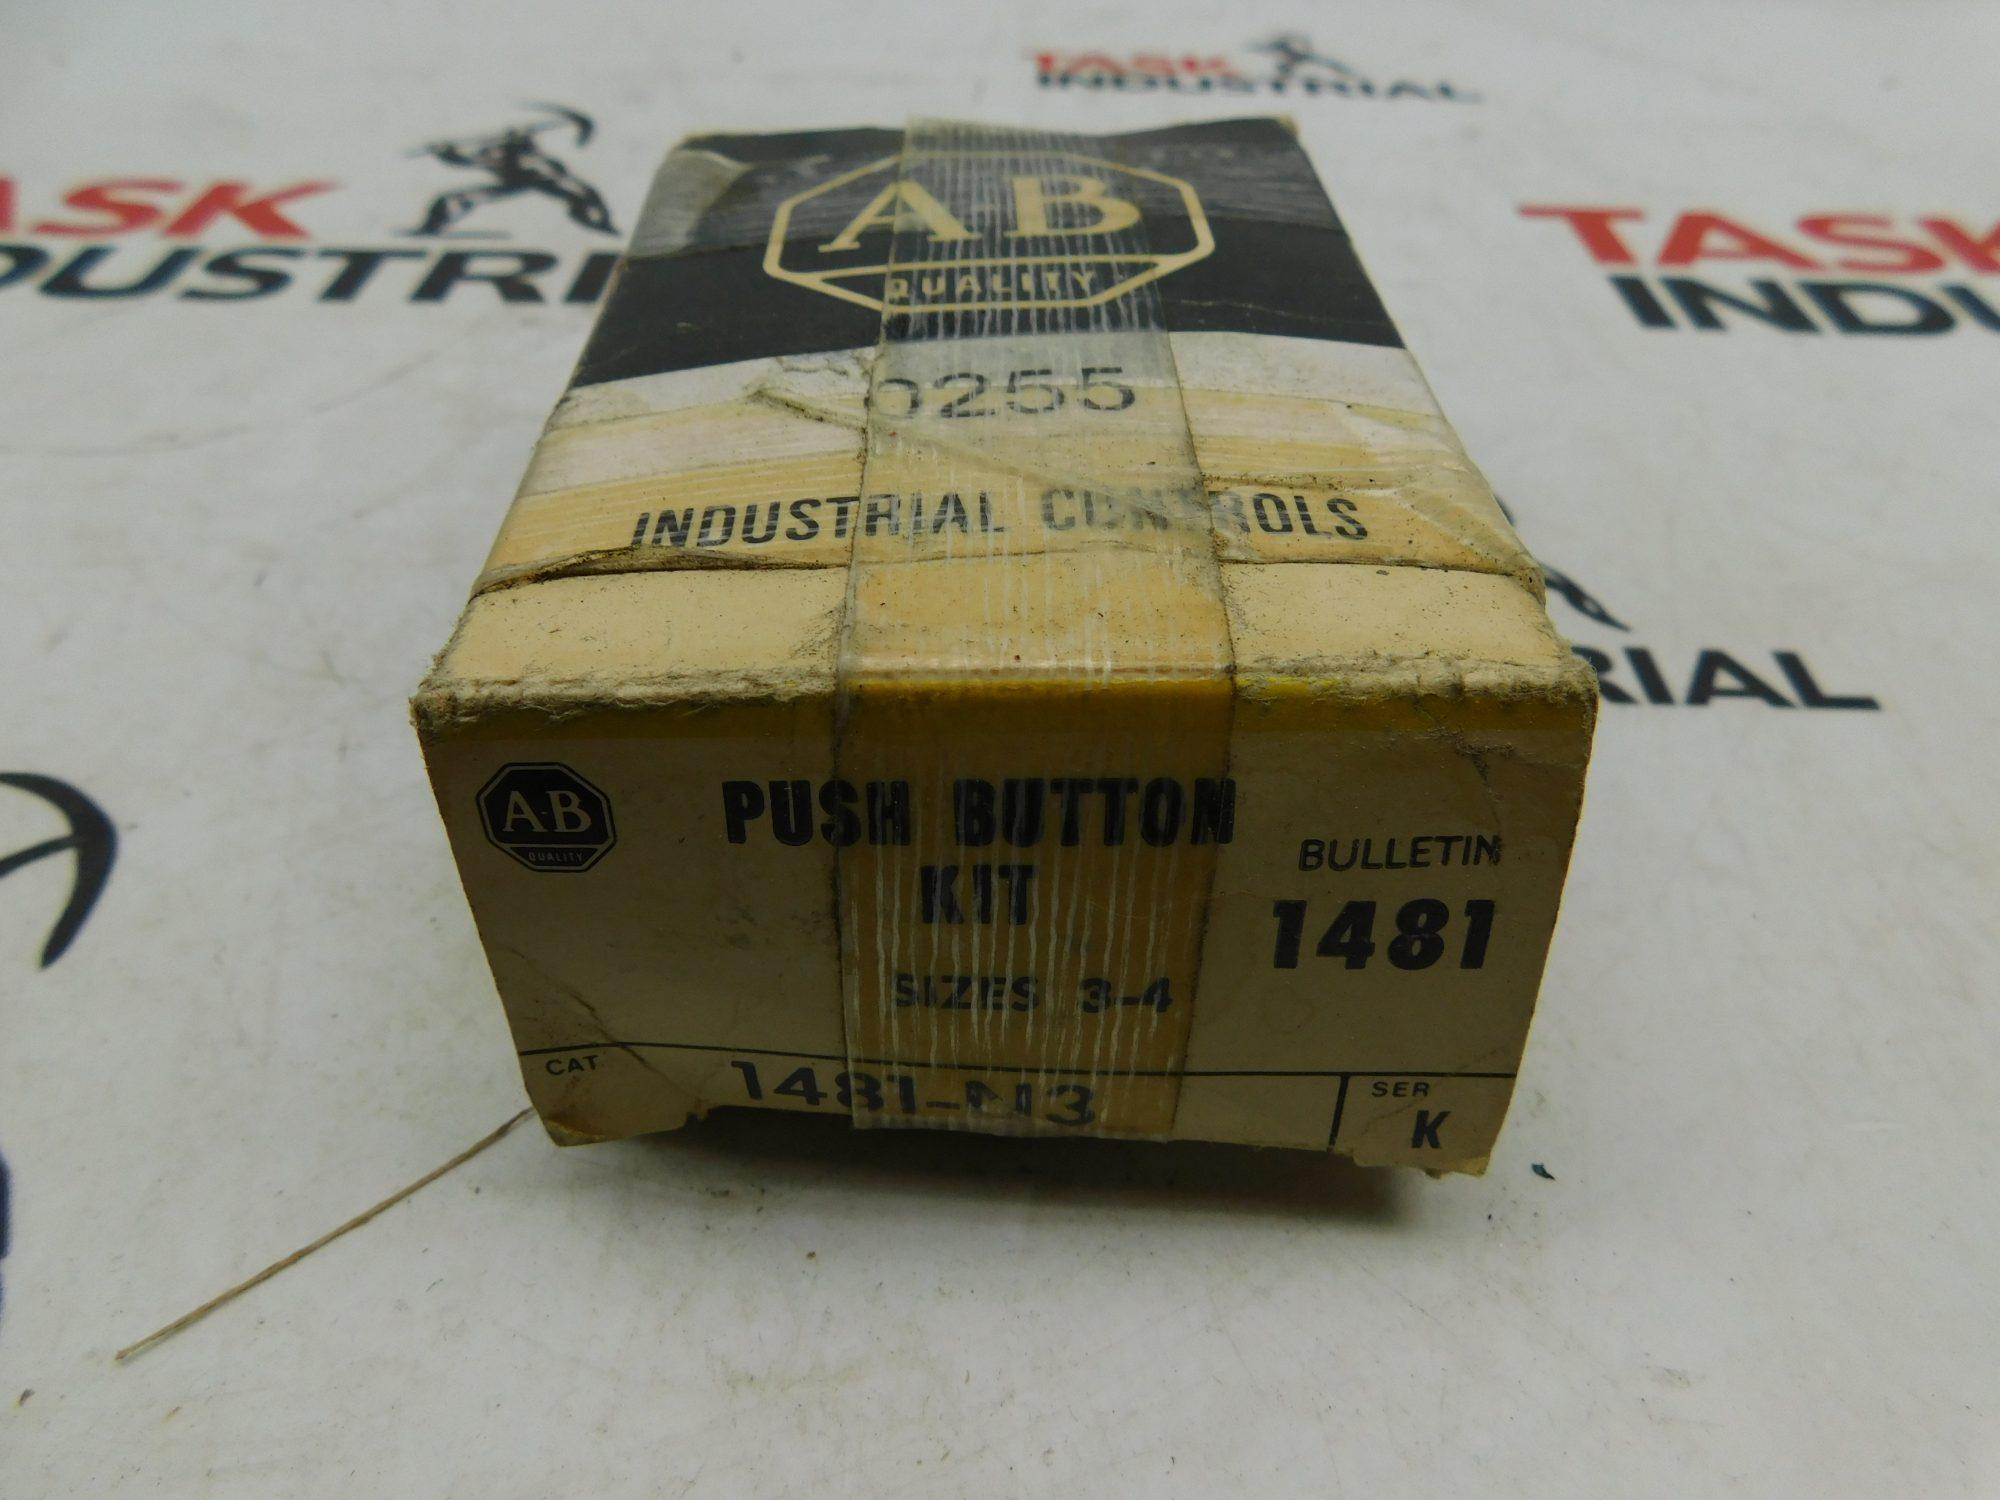 Allen-Bradley CAT No. 1481-N3 Series K Push Button Kit Sizes 3-4